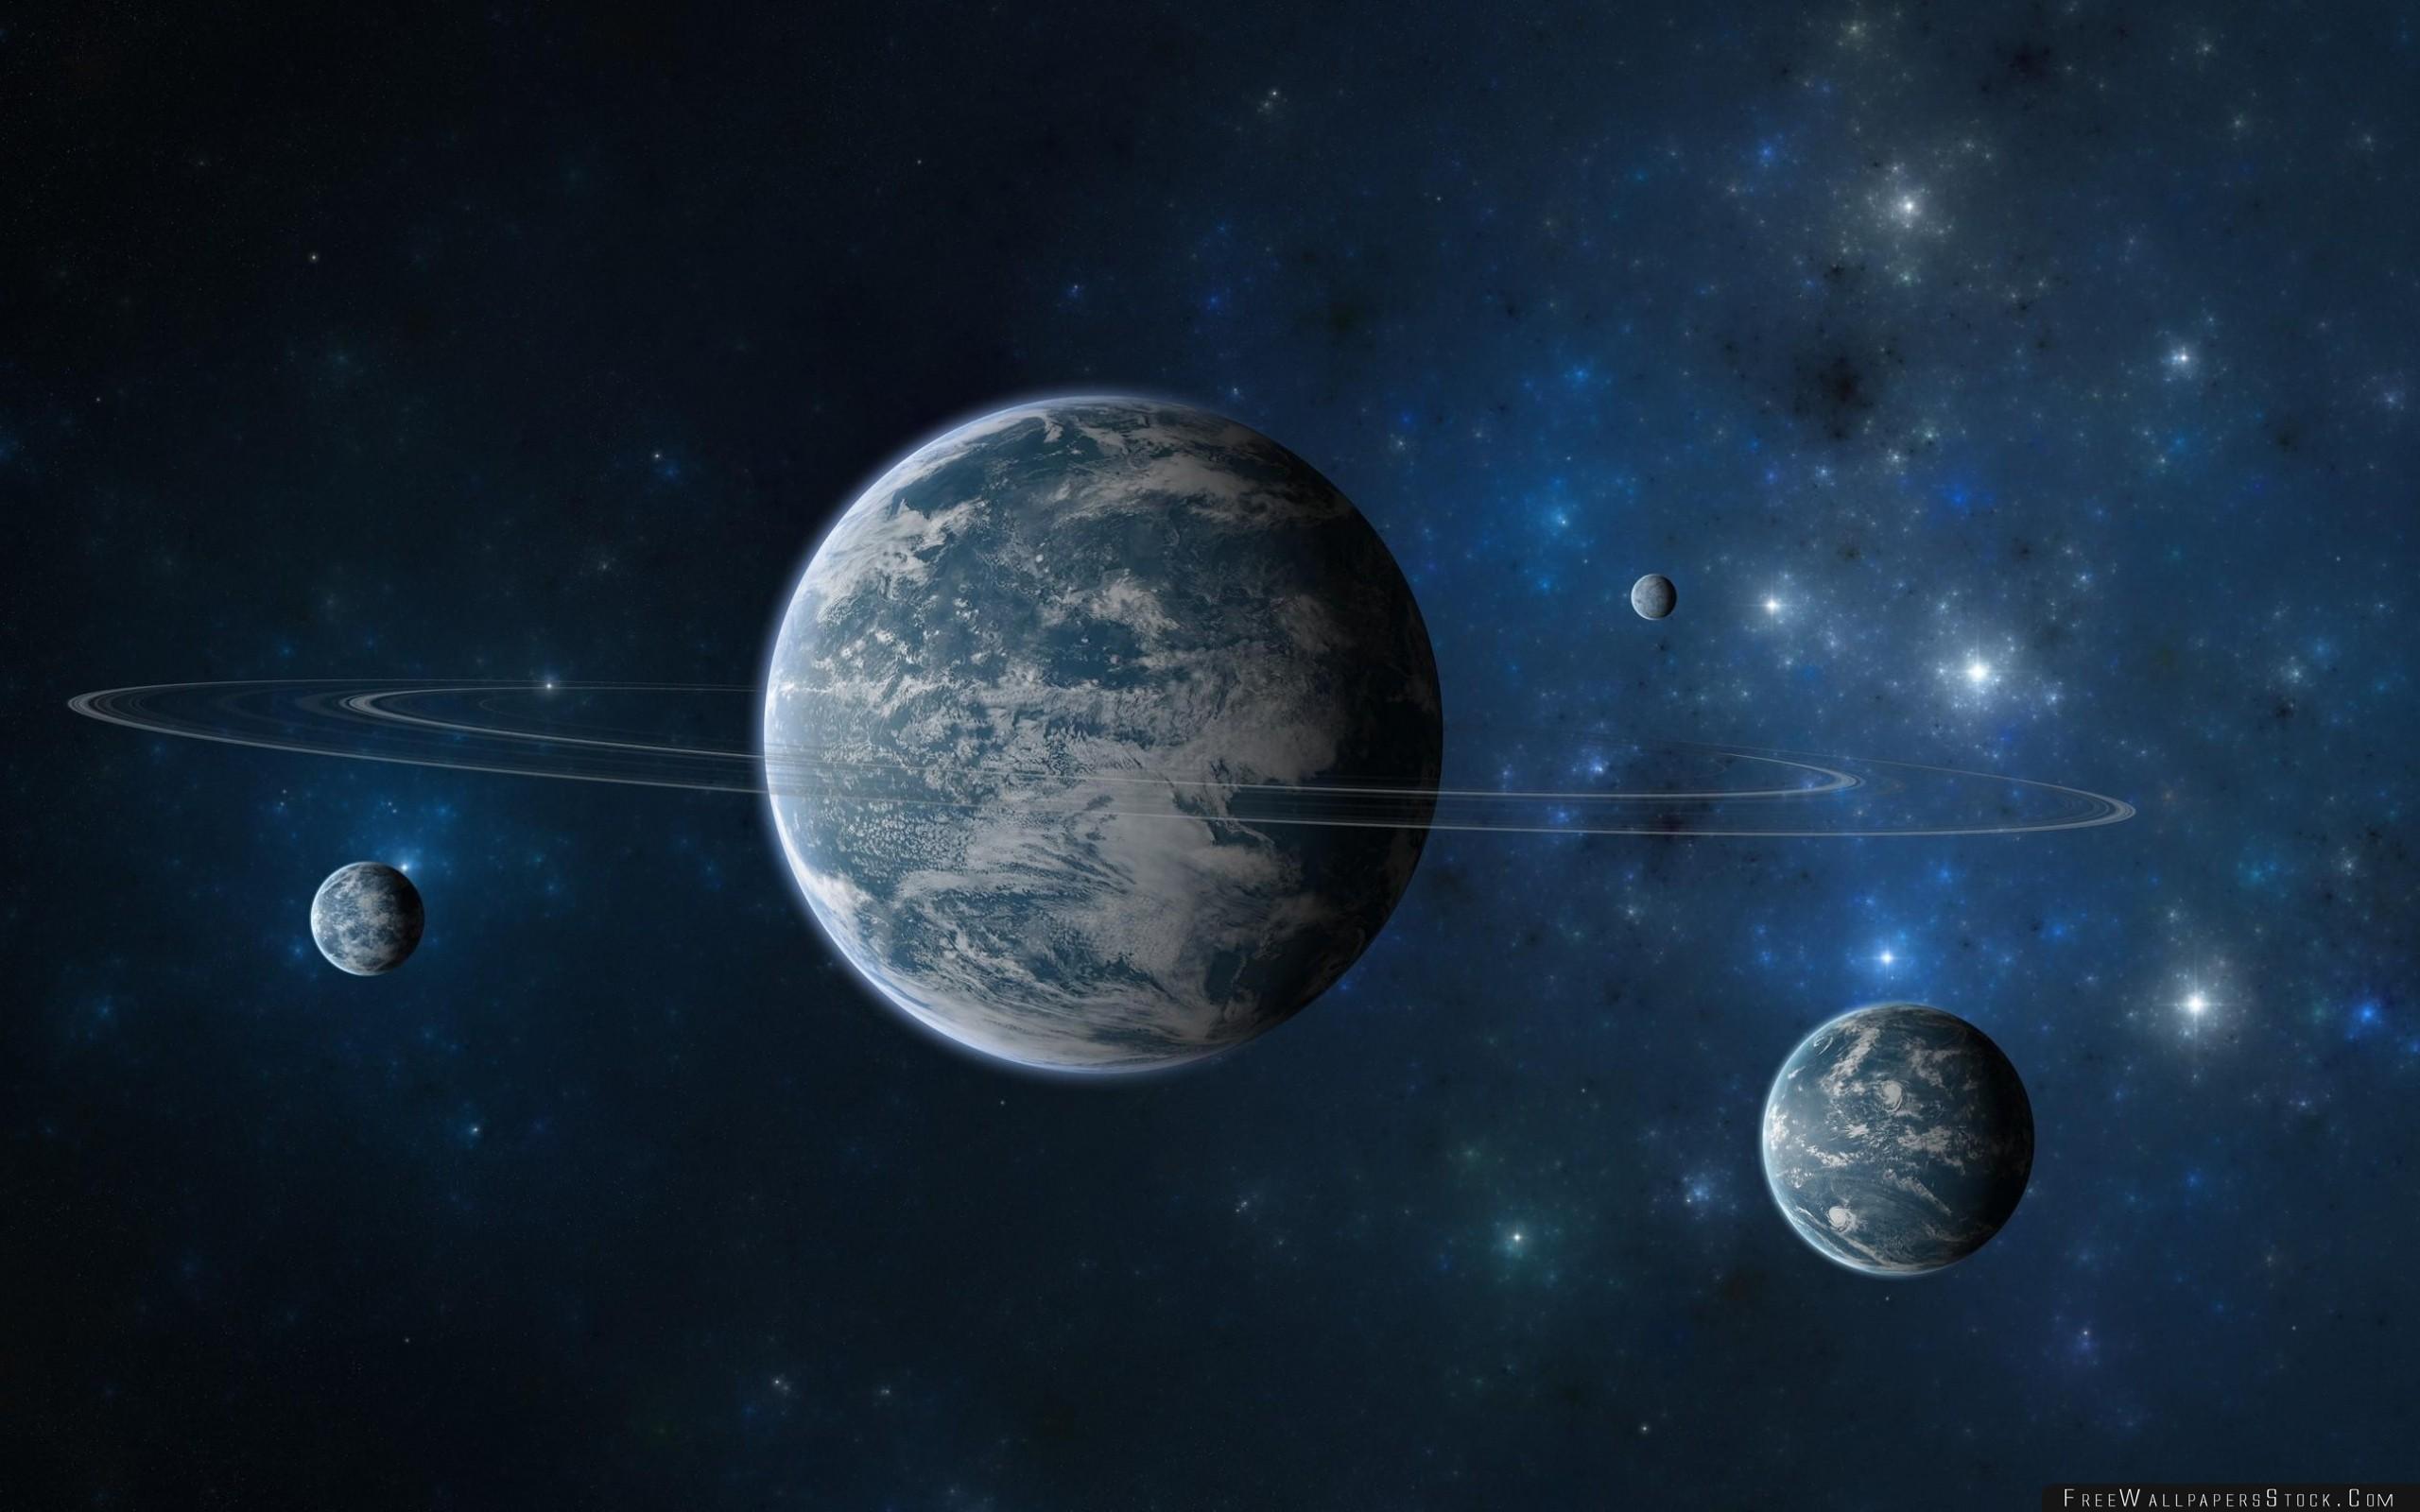 Download Free Wallpaper Planet Ring Moon Stars Galaxies